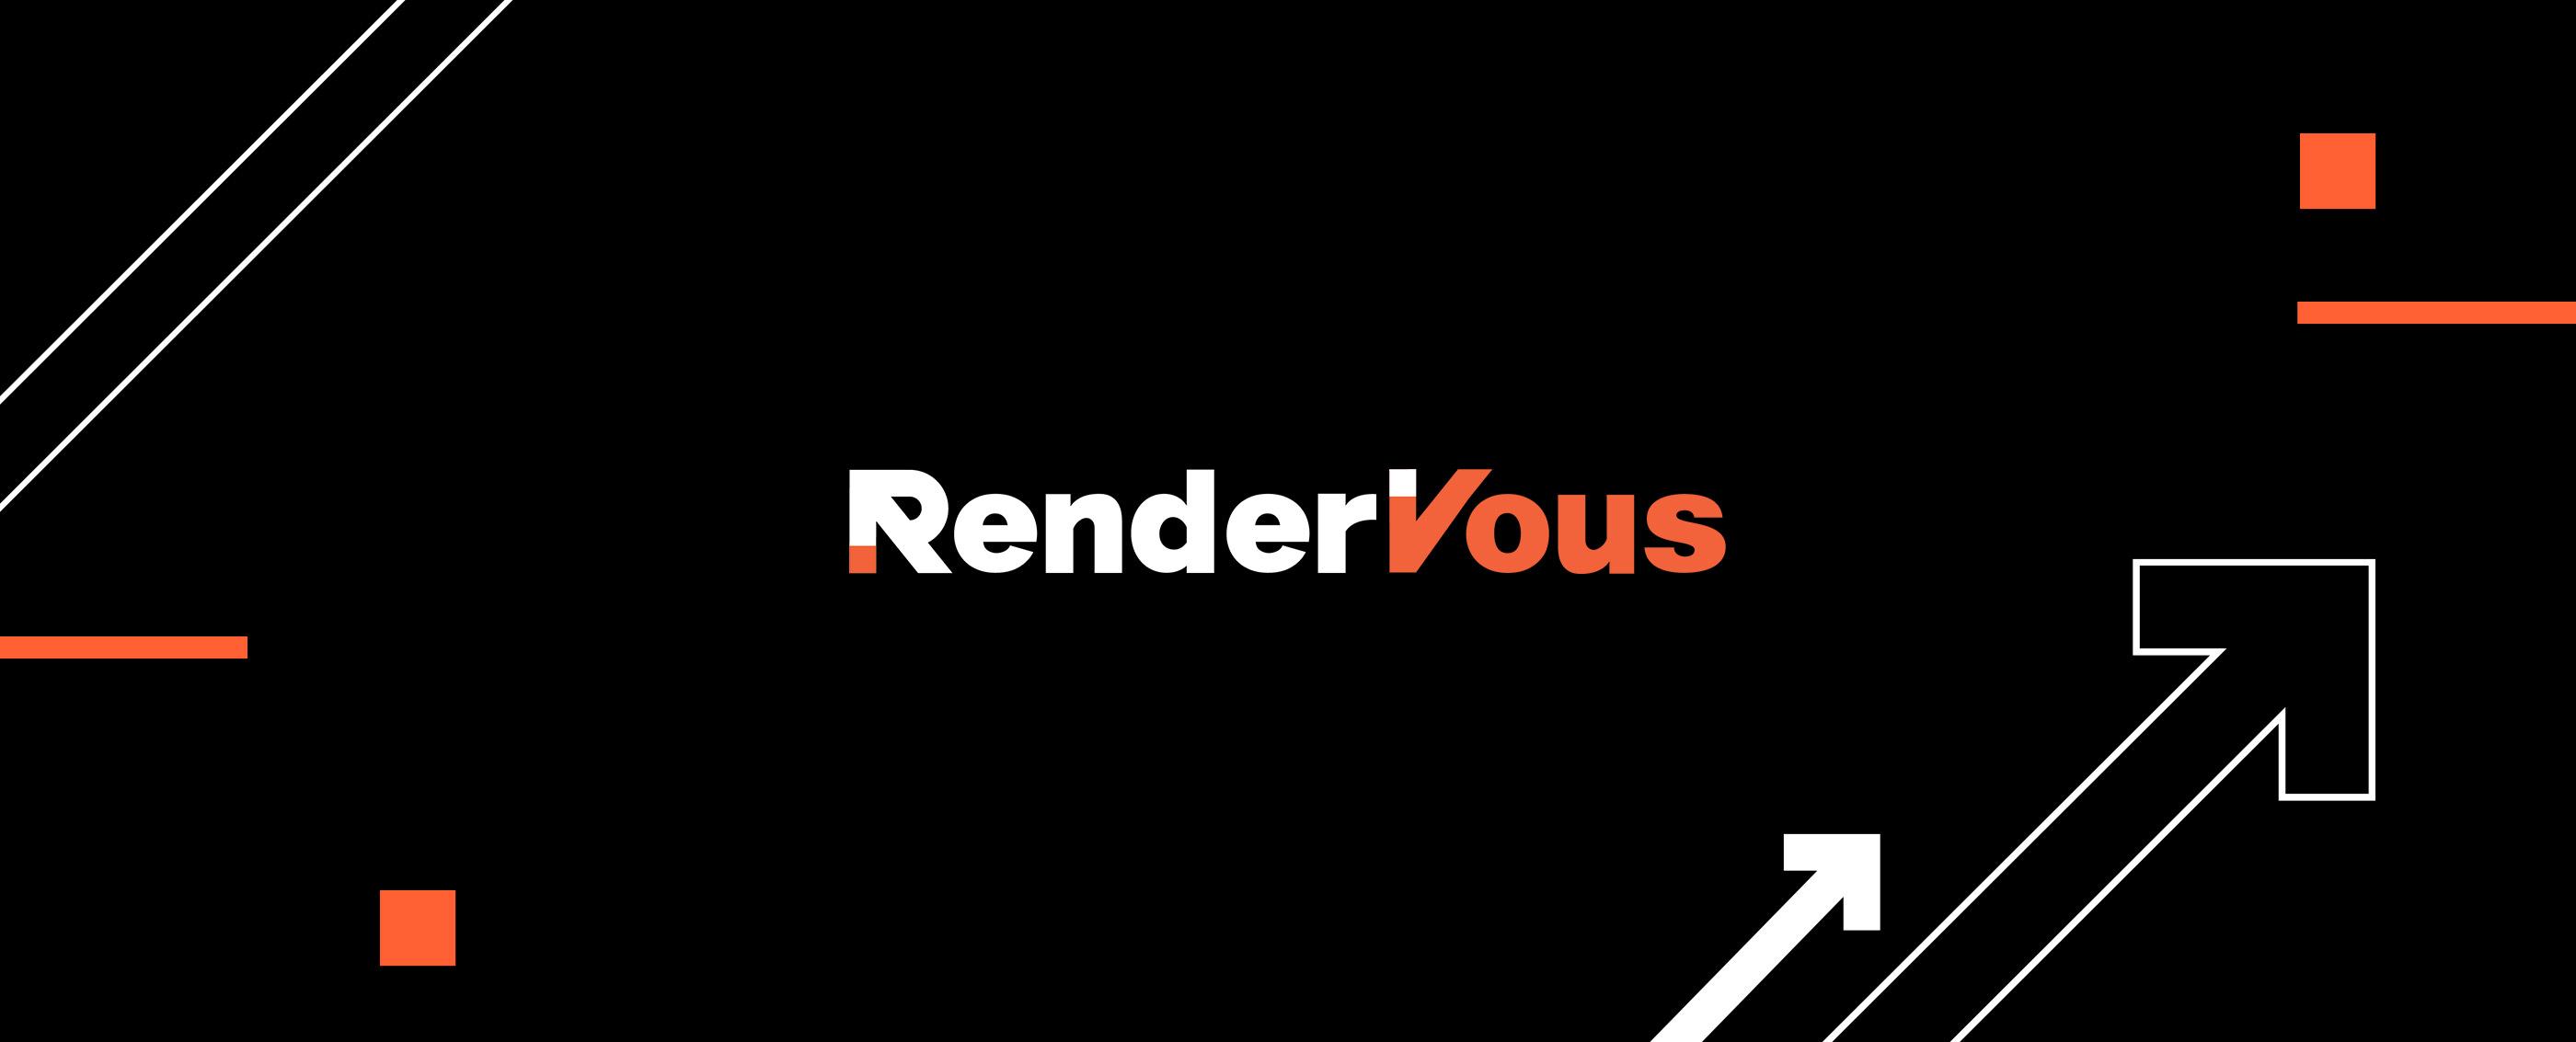 RenderVous